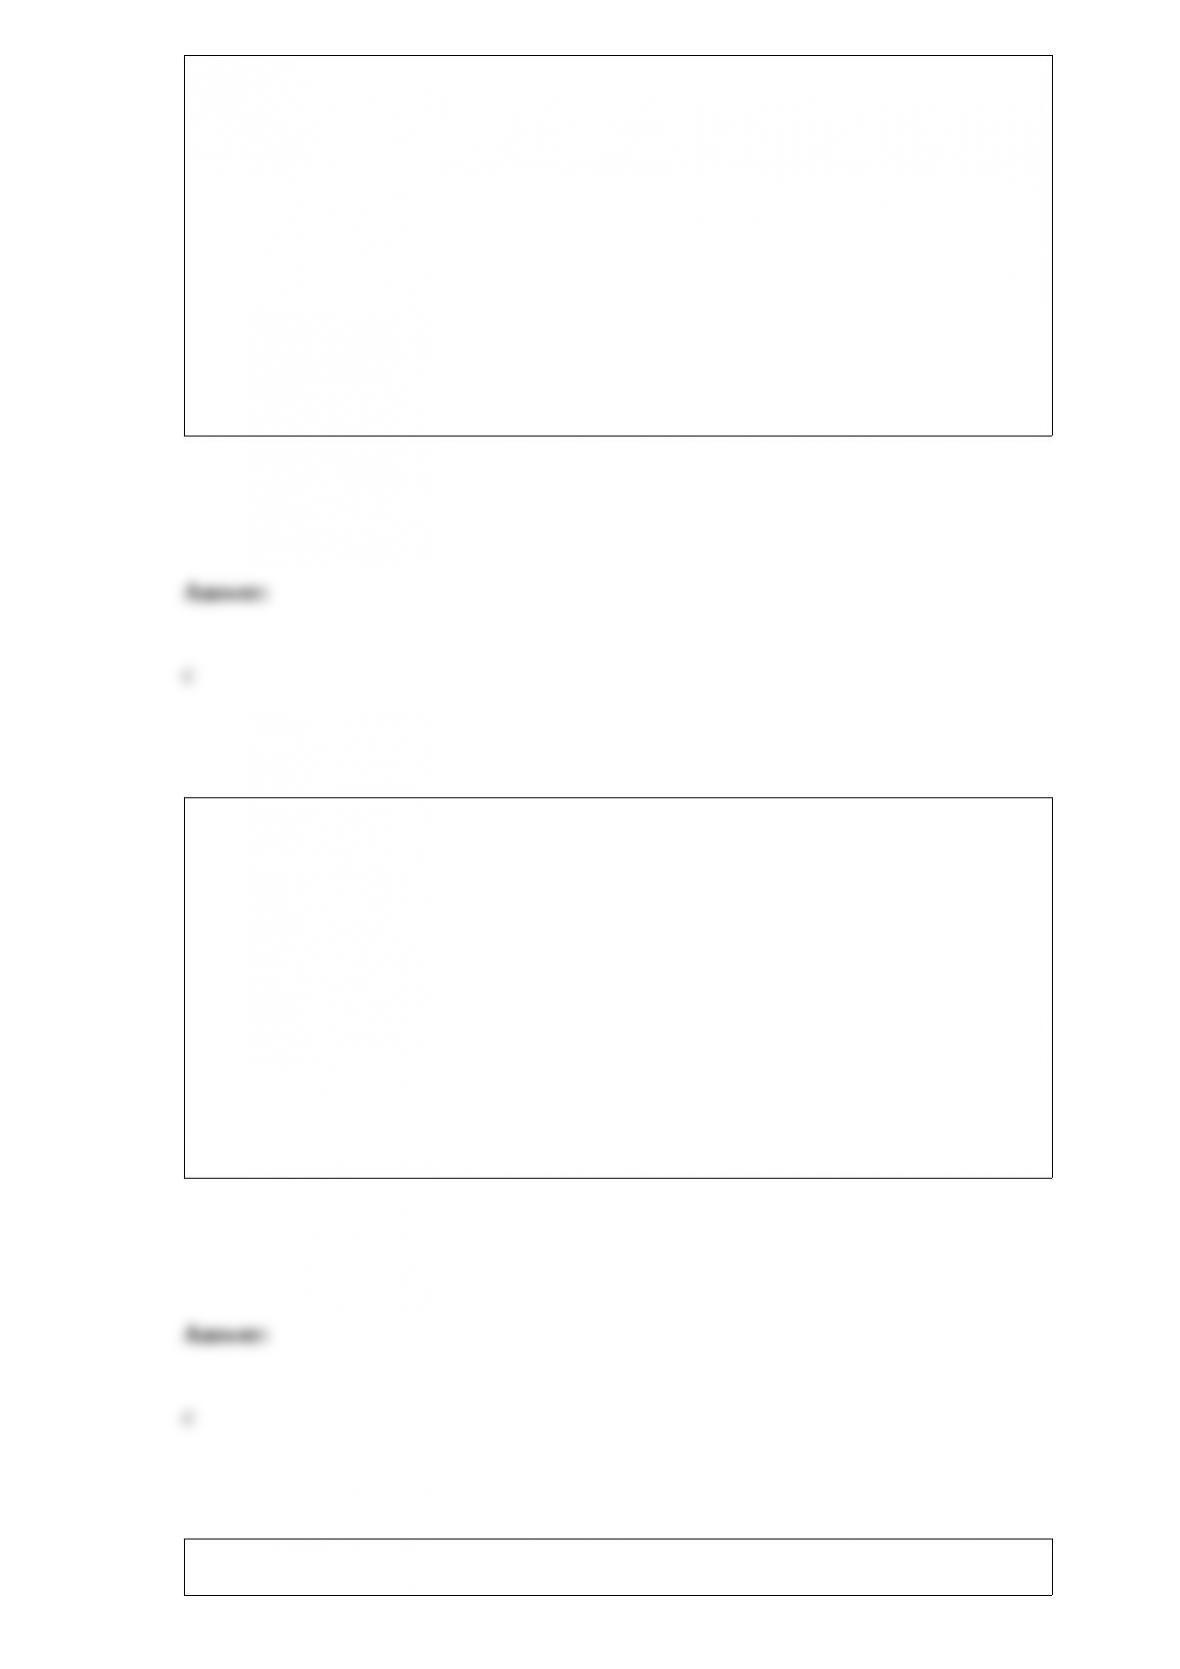 ANT 28665 | Get 24/7 Homework Help | Online Study Solutions